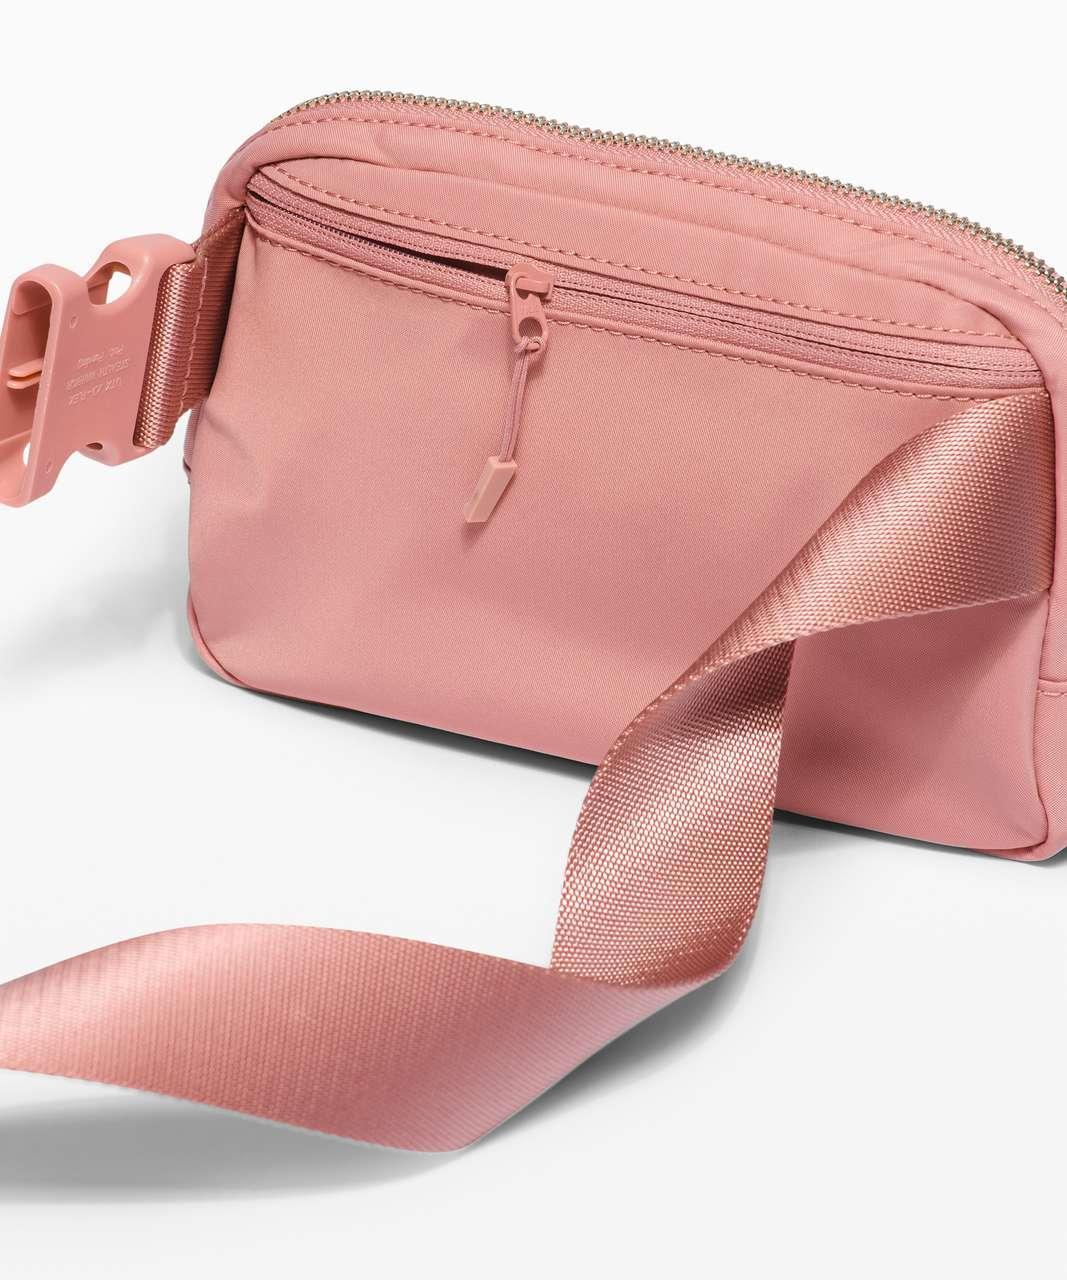 Lululemon Everywhere Belt Bag *1L - Pink Pastel